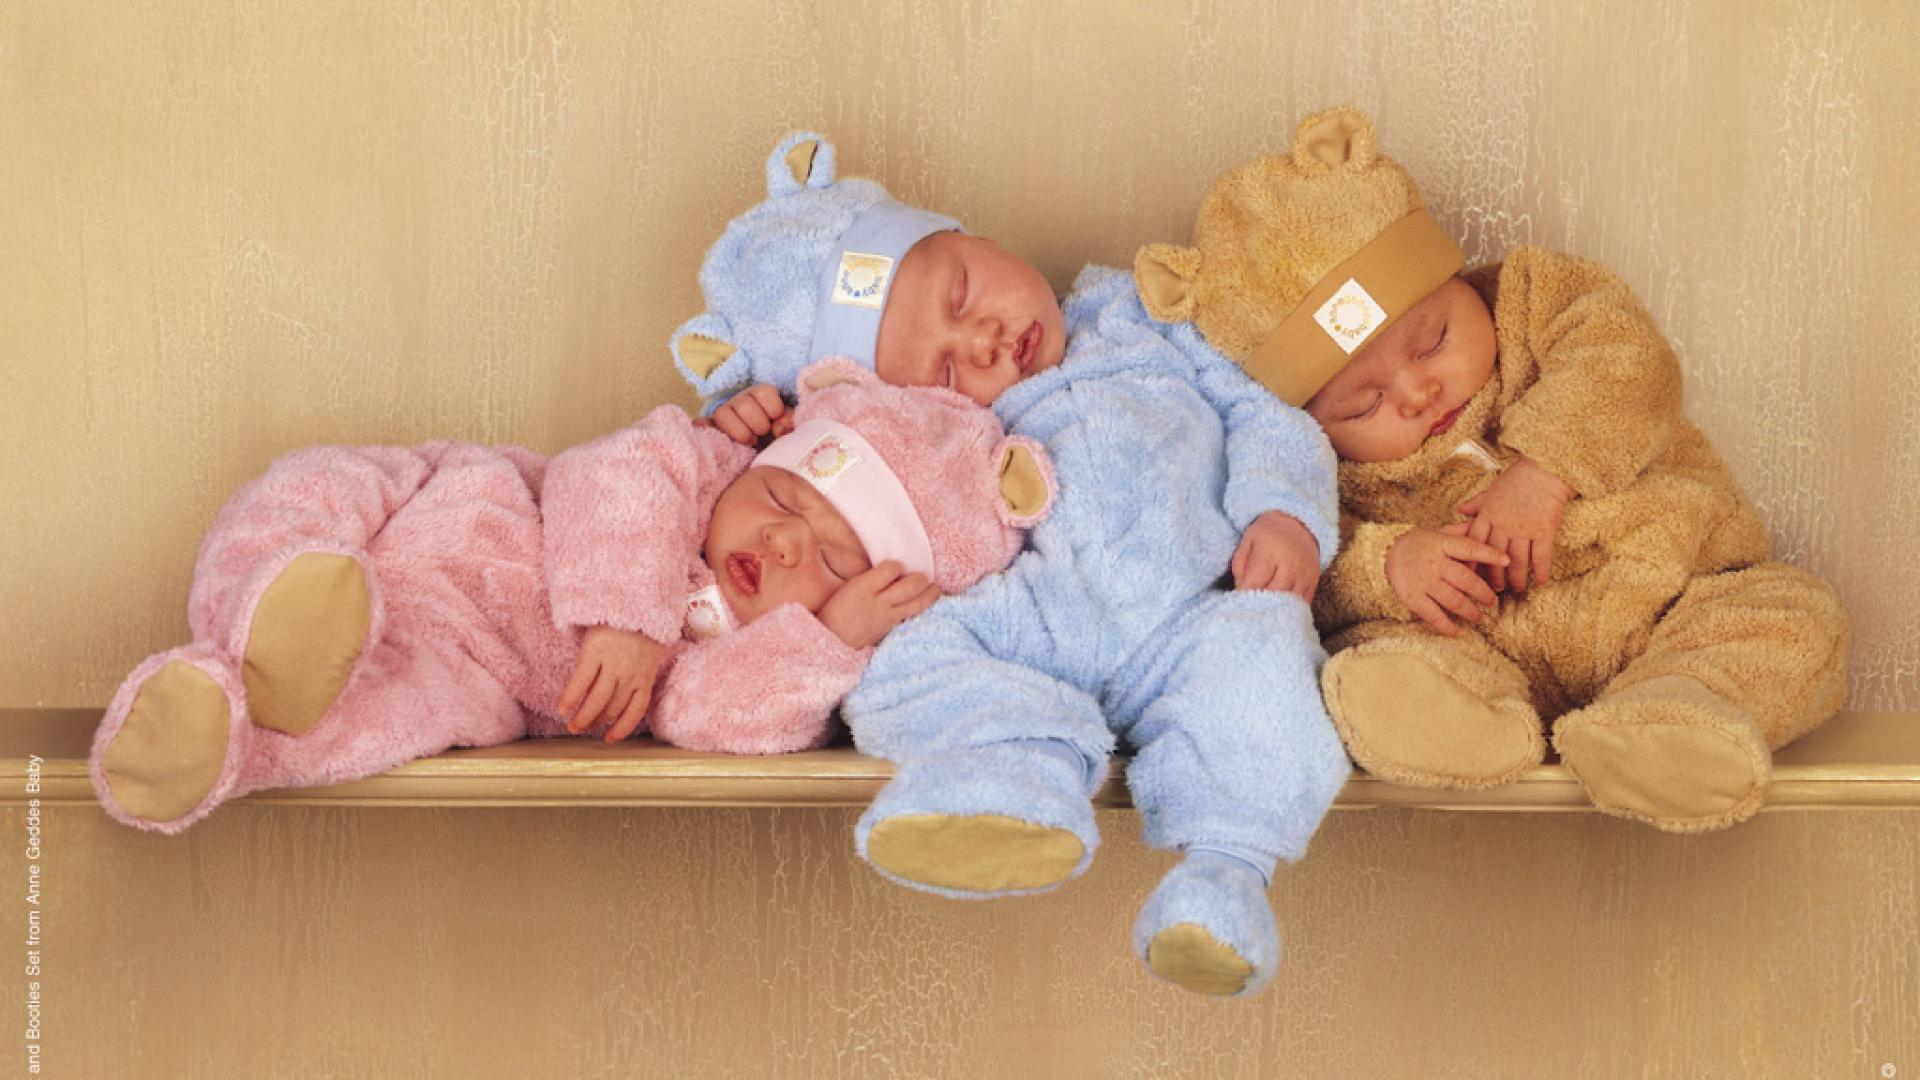 Cute baby hd widescreen wallpaper 1233 blissful babies cute baby hd widescreen wallpaper 1233 voltagebd Images